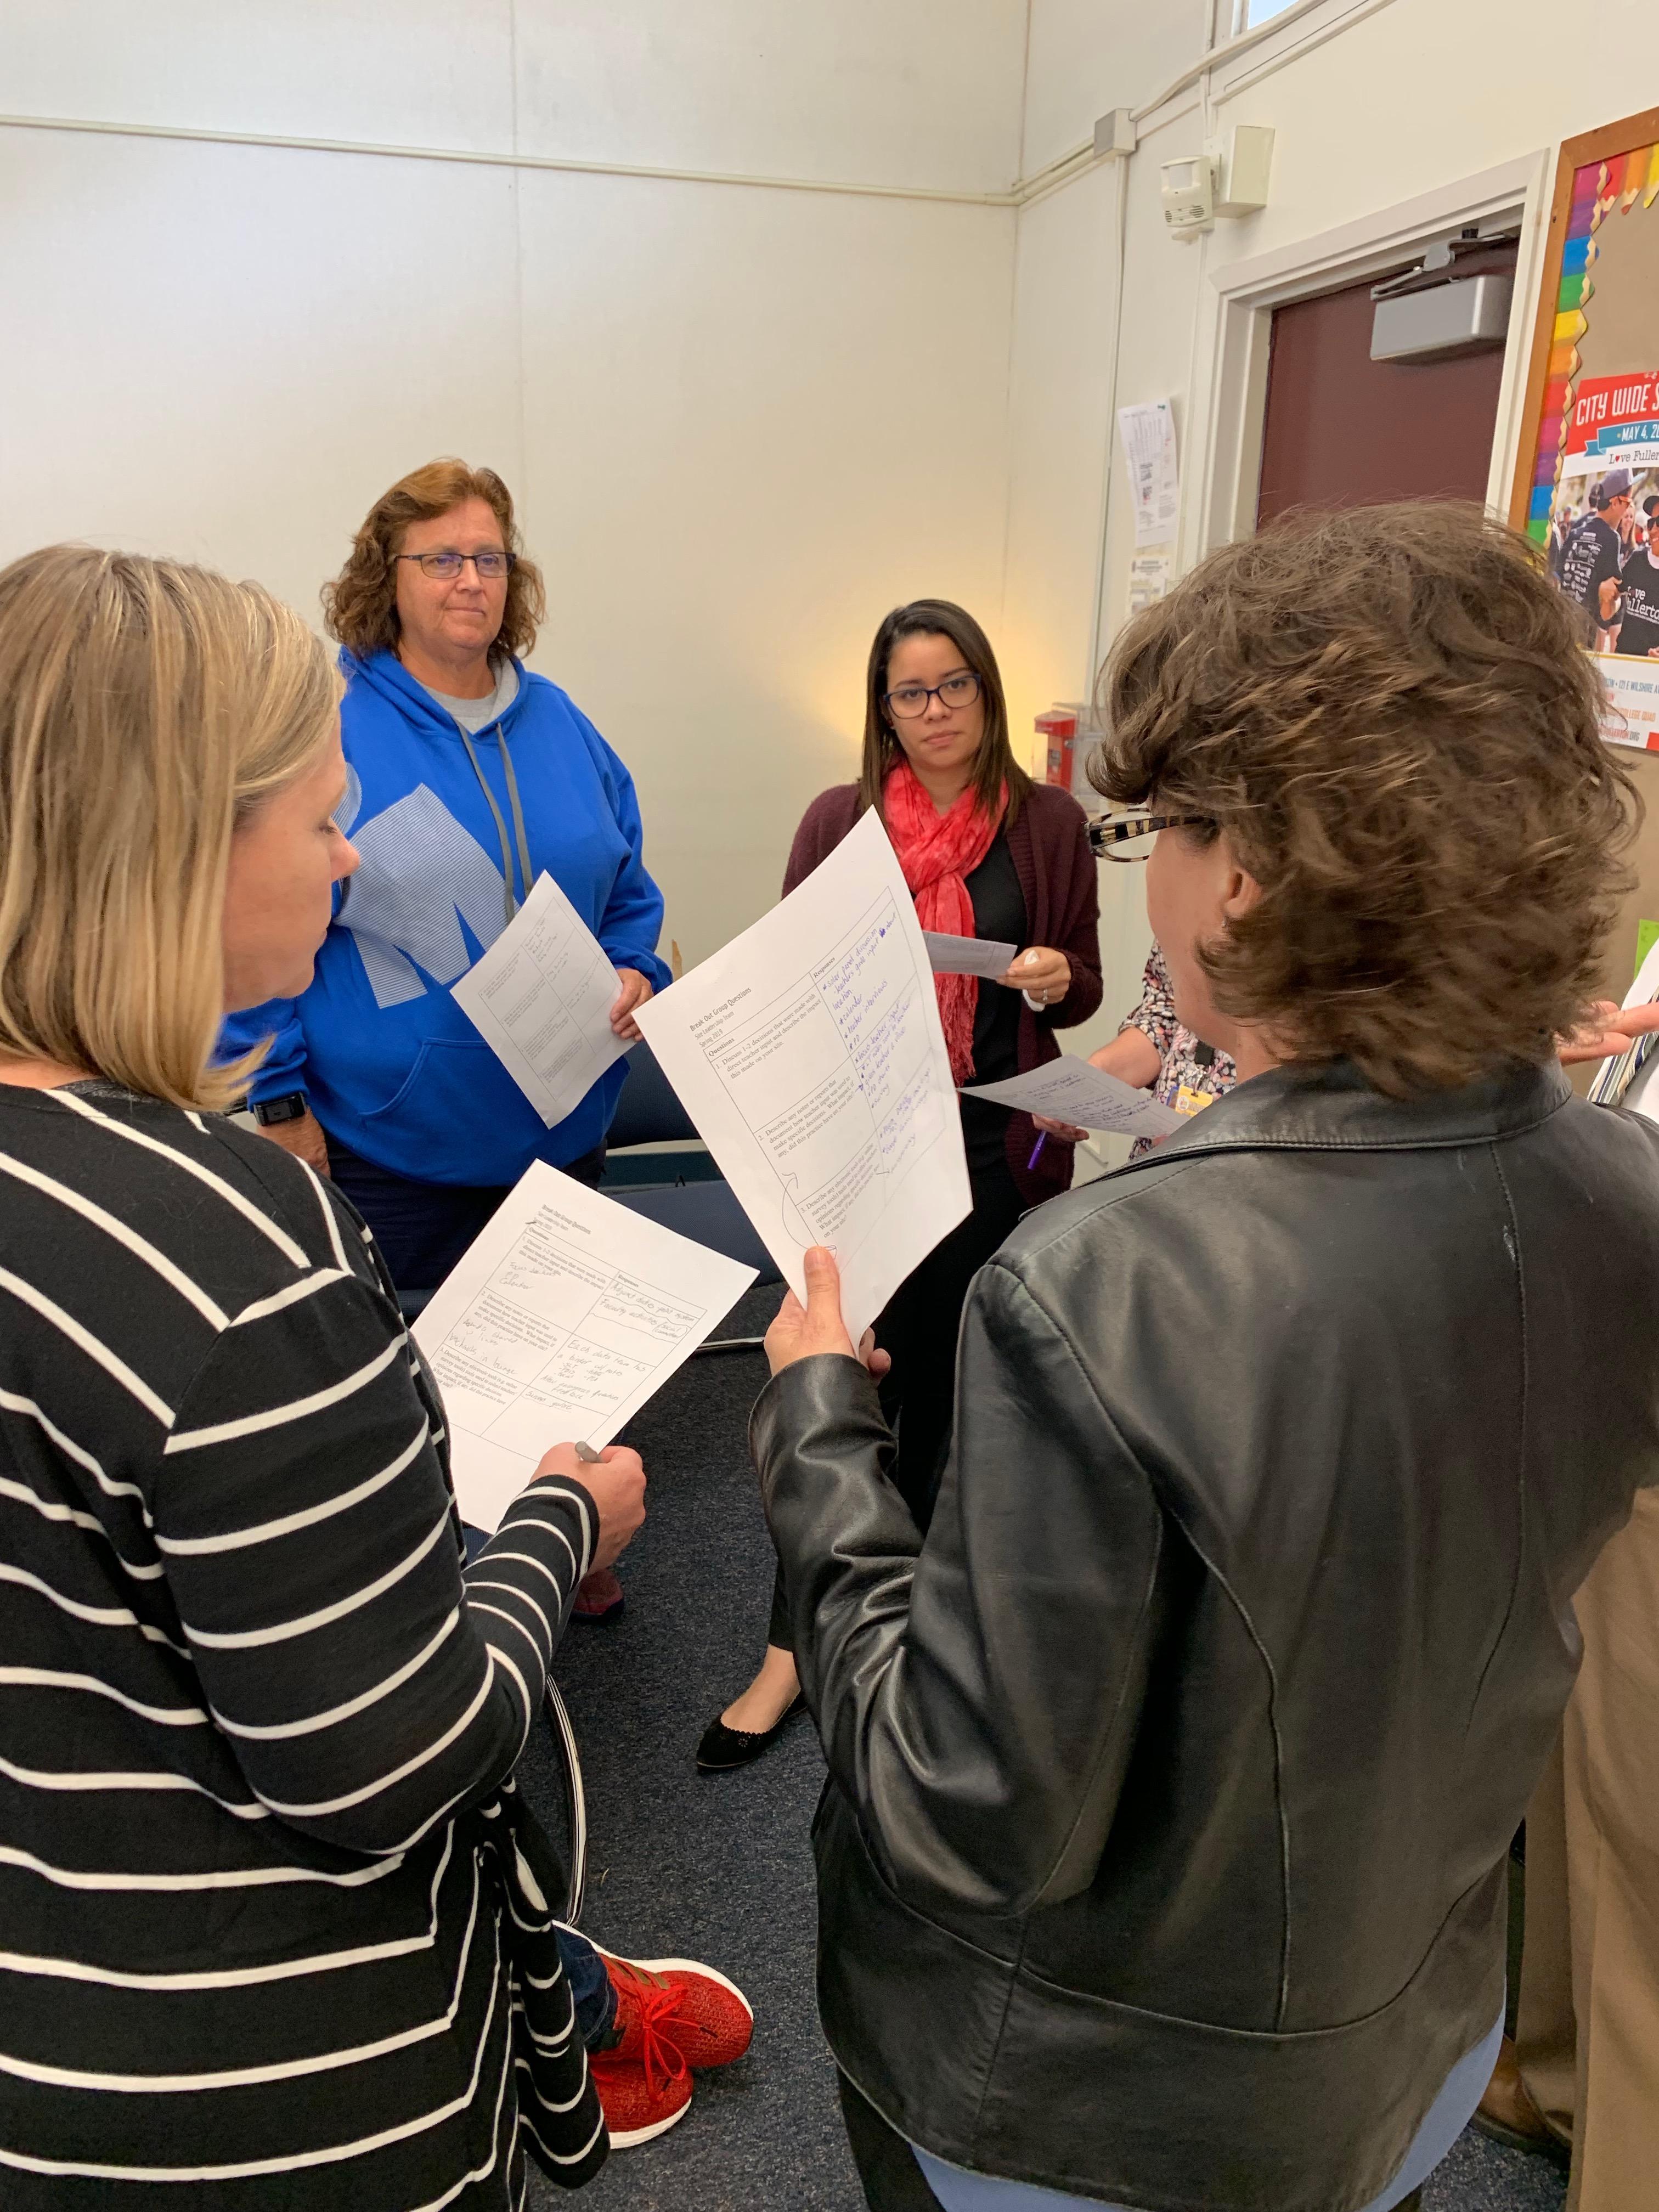 Teachers working together.